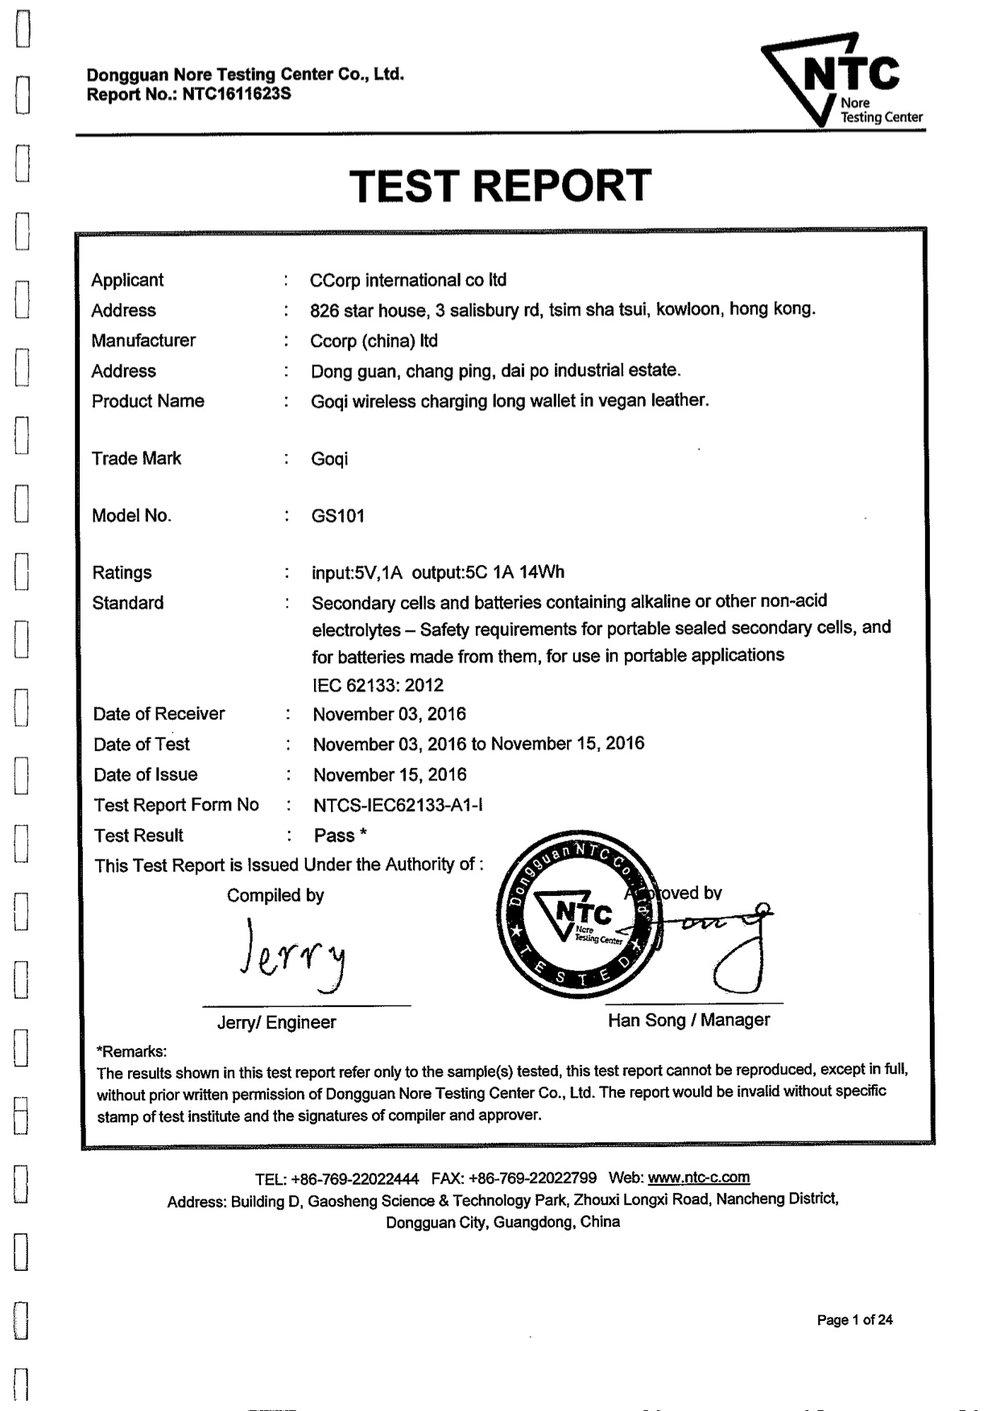 Certifications iec62133 goqi wireless charging wallets xflitez Images